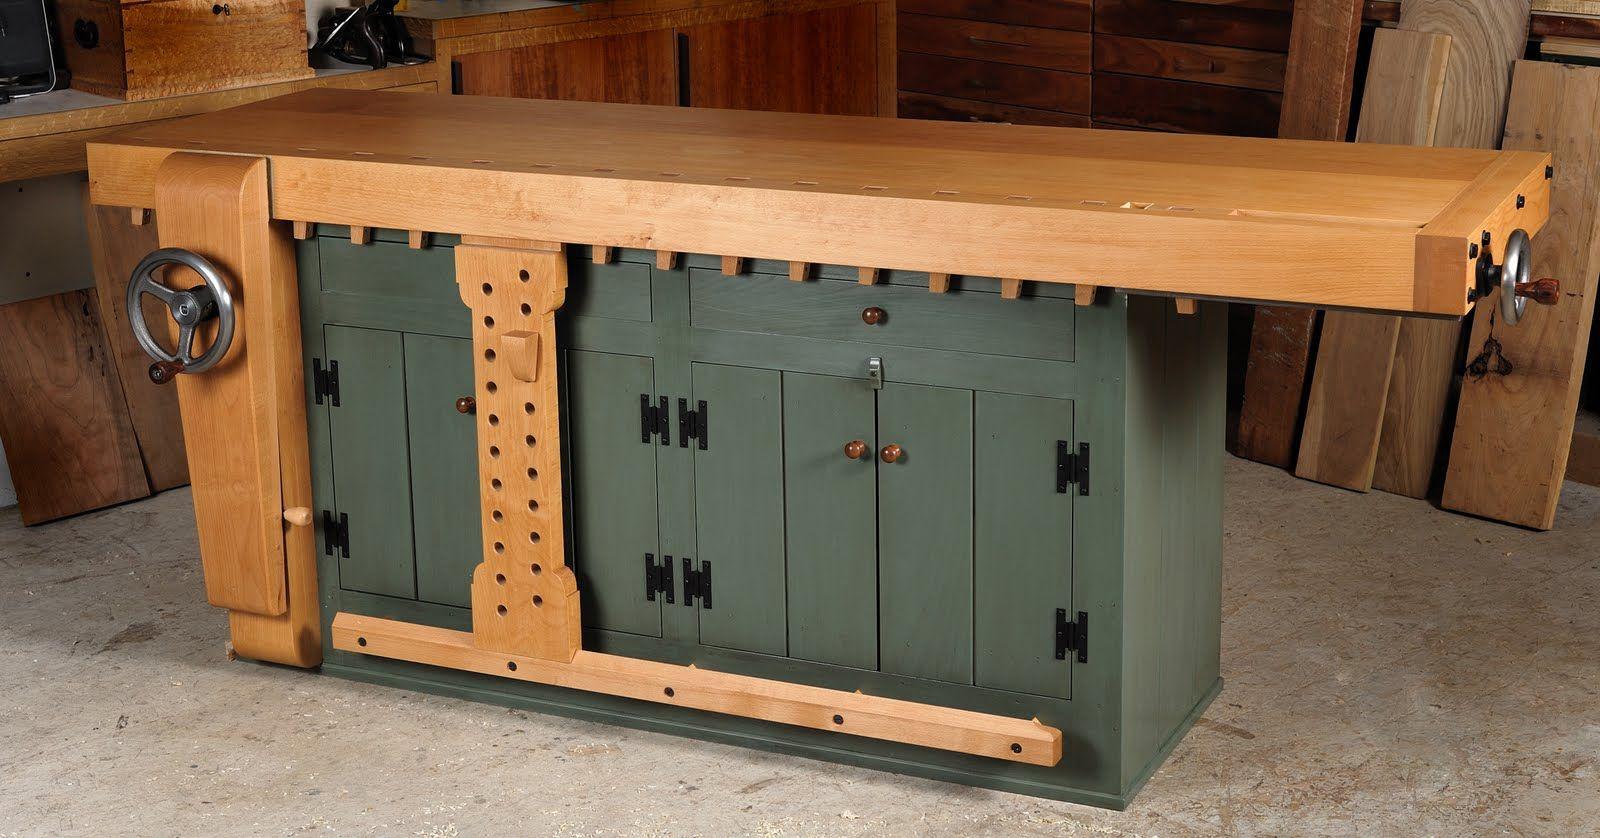 shaker workbench for sale | rare opportunity: shaker-style bench for